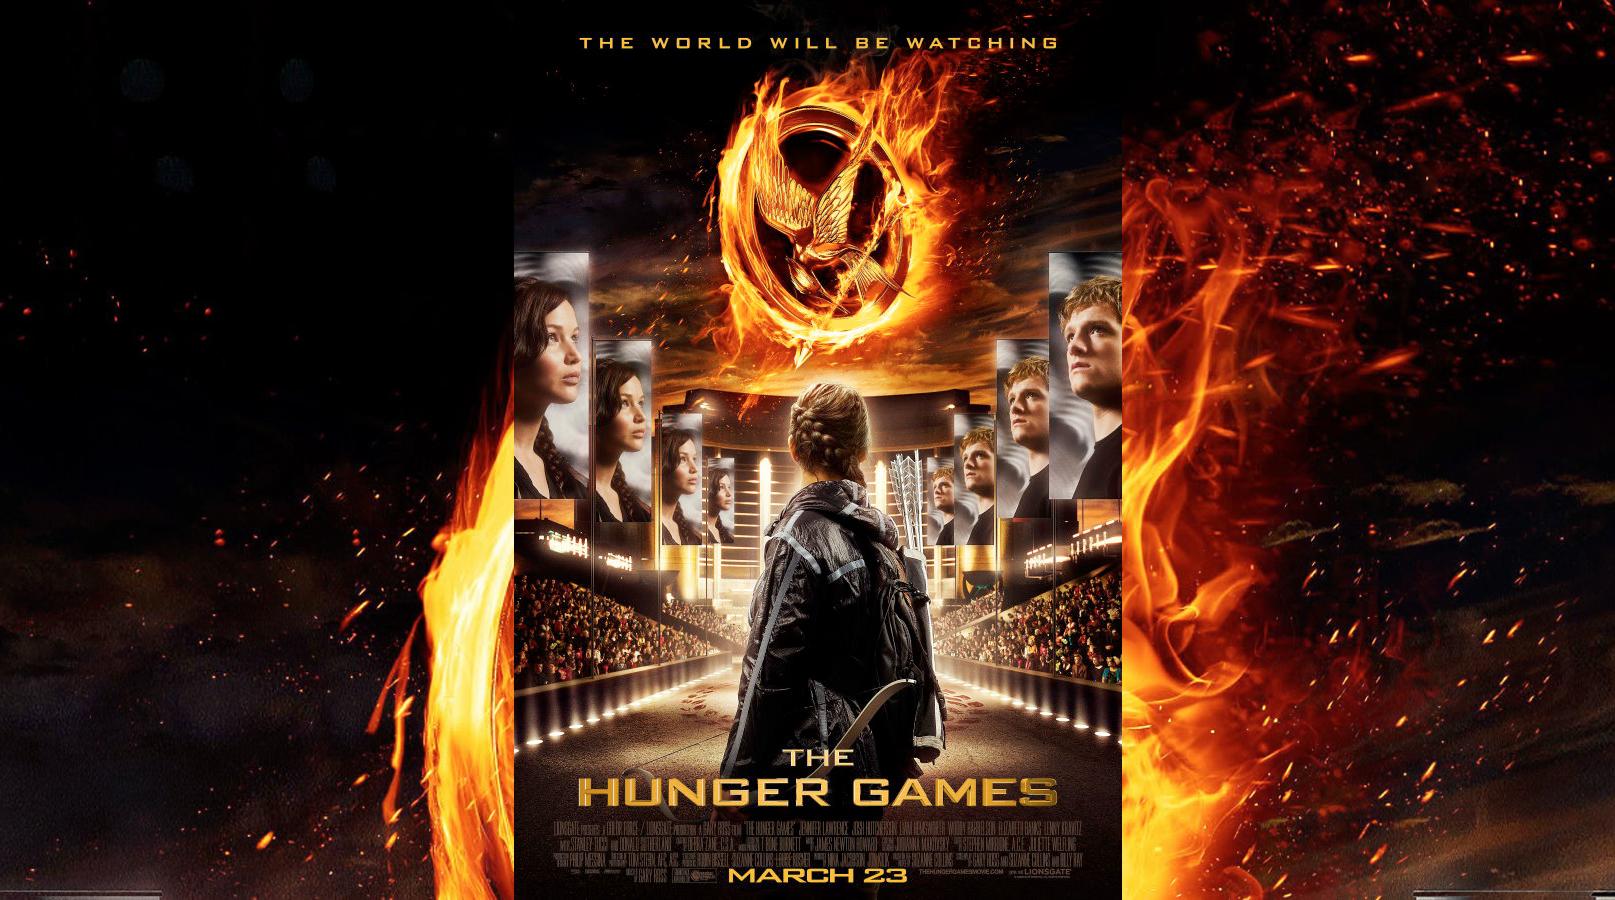 The Hunger Games wallpaper 1615x900